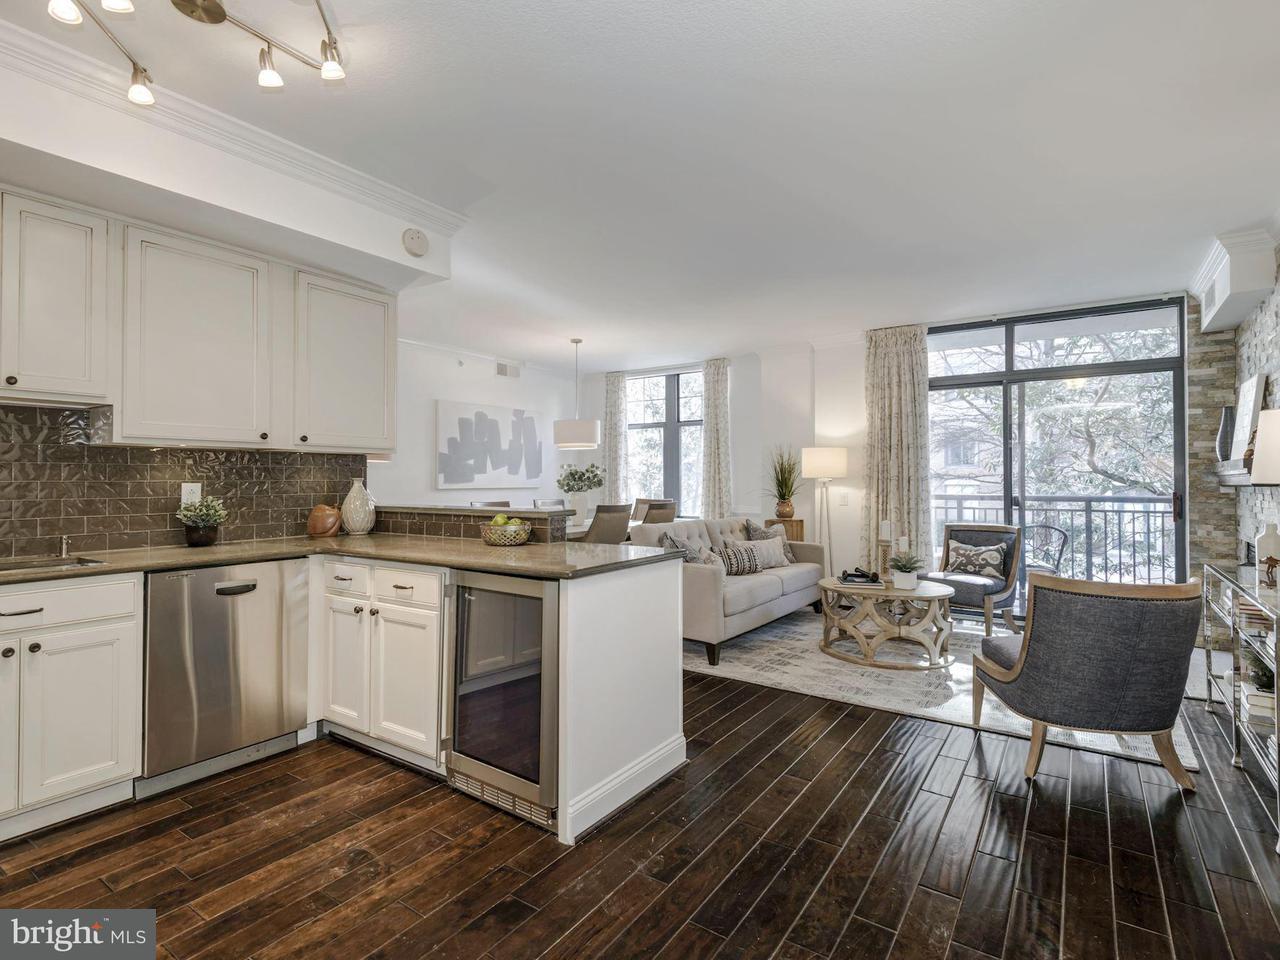 Condominium for Sale at 1021 Garfield St #205 1021 Garfield St #205 Arlington, Virginia 22201 United States